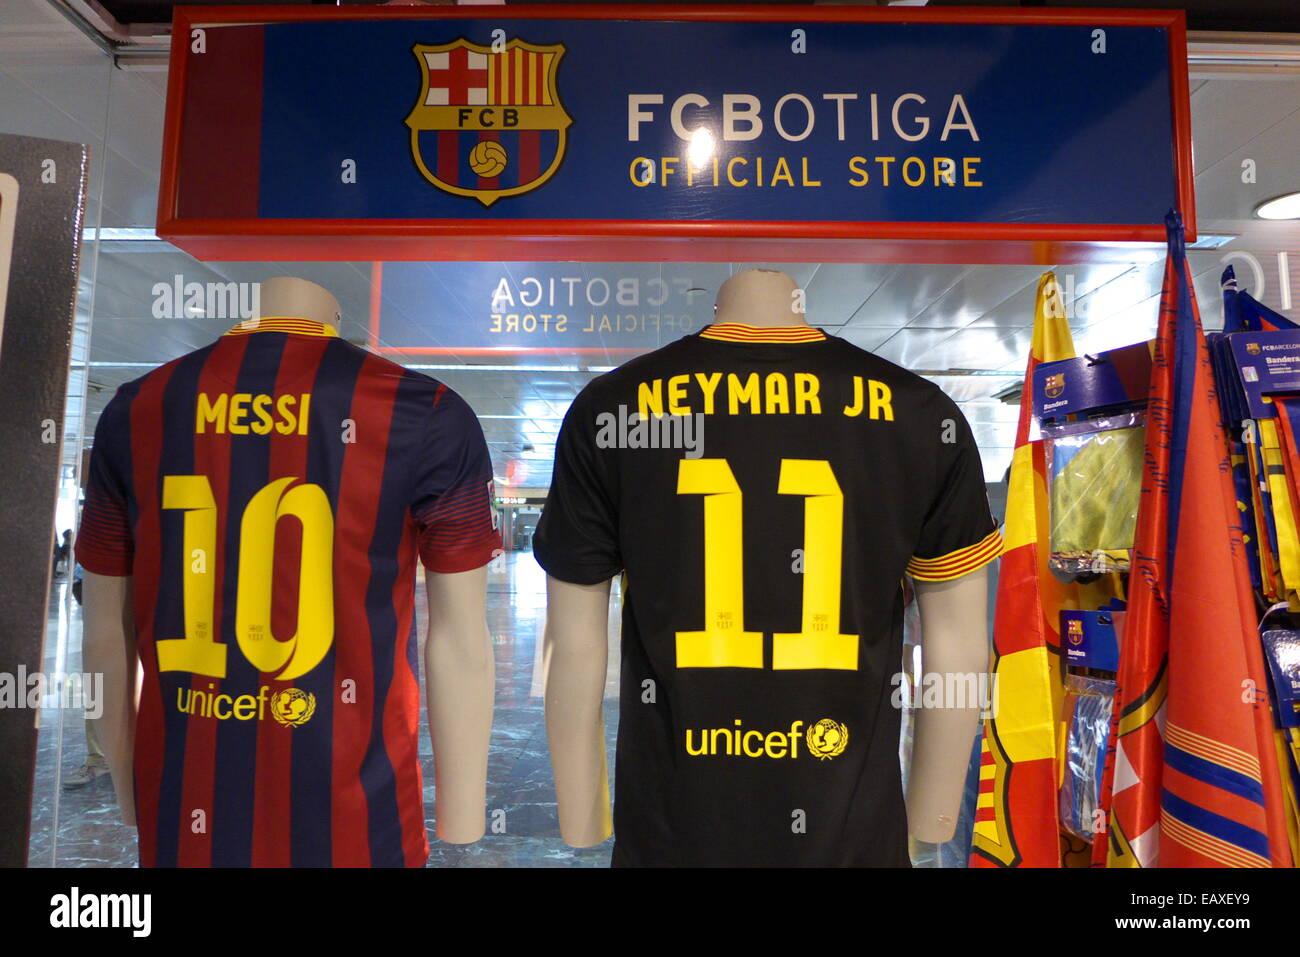 Spain Catalonia Barcelona FC Barcelona Fan club souvenirs shop Stock ... 9a318010cc8